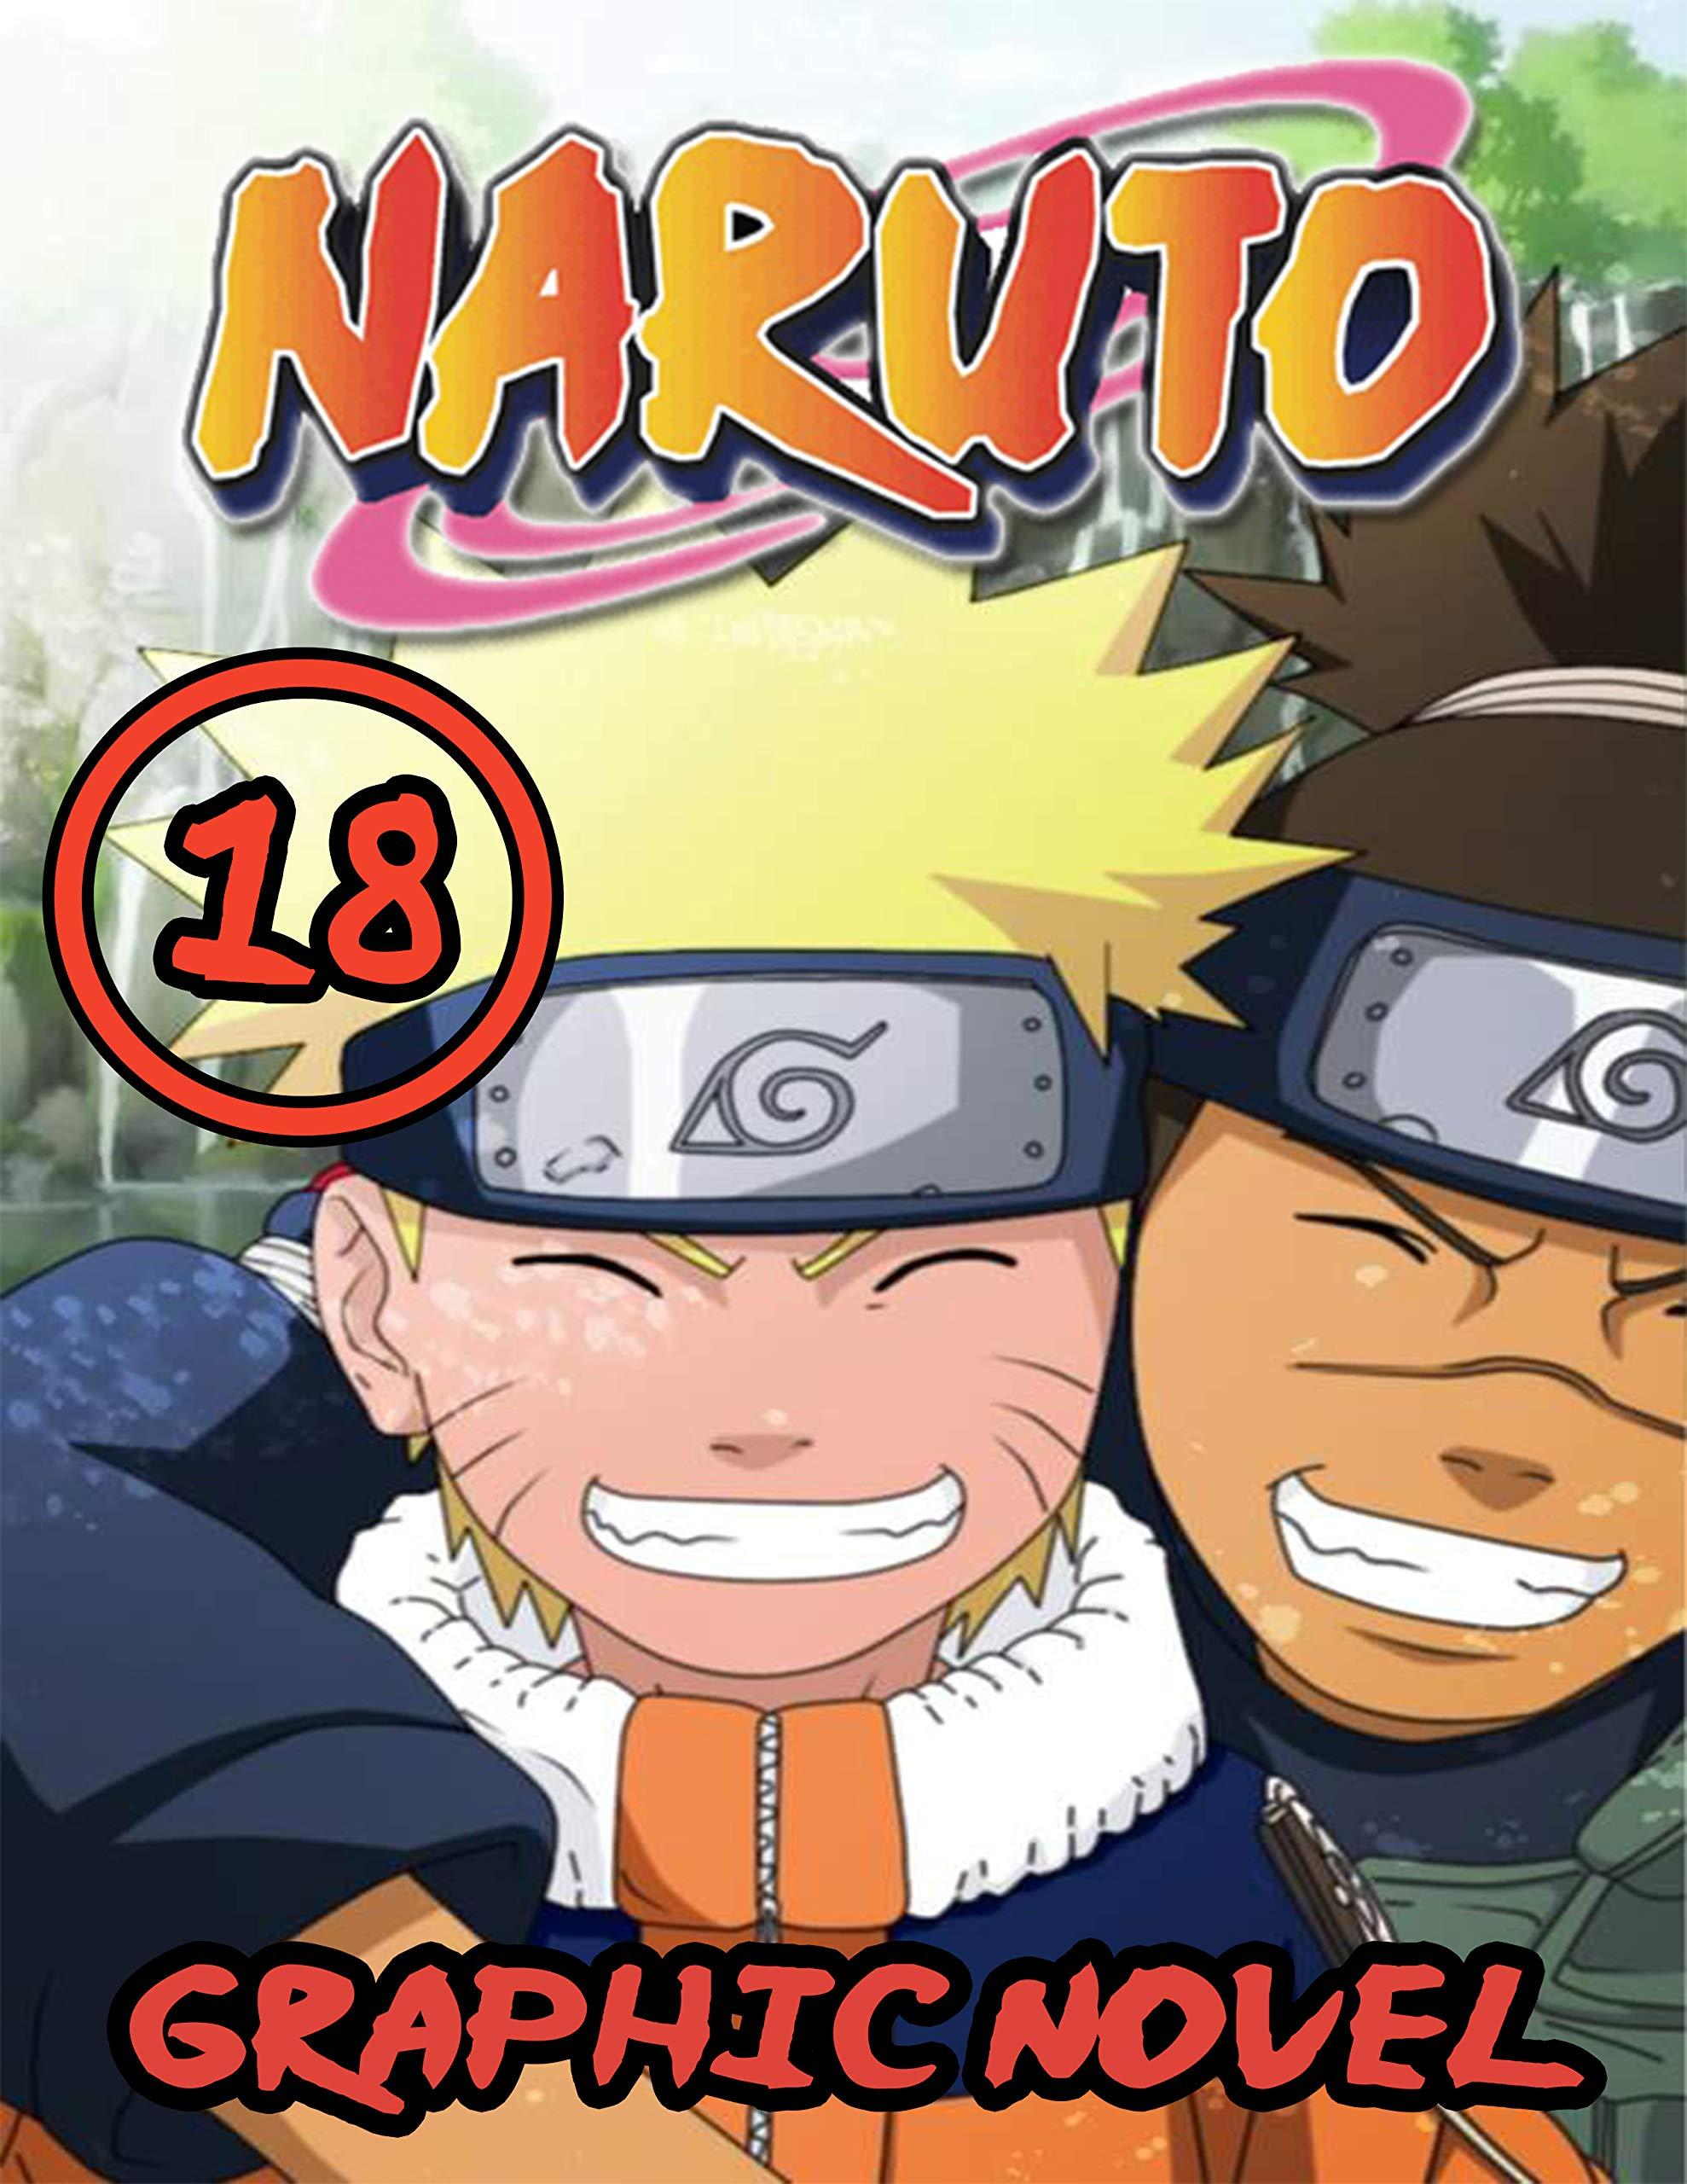 Naruto Graphic Novel: Vol 18 - Full Color Great Shounen Manga For Young & Teens , Adults